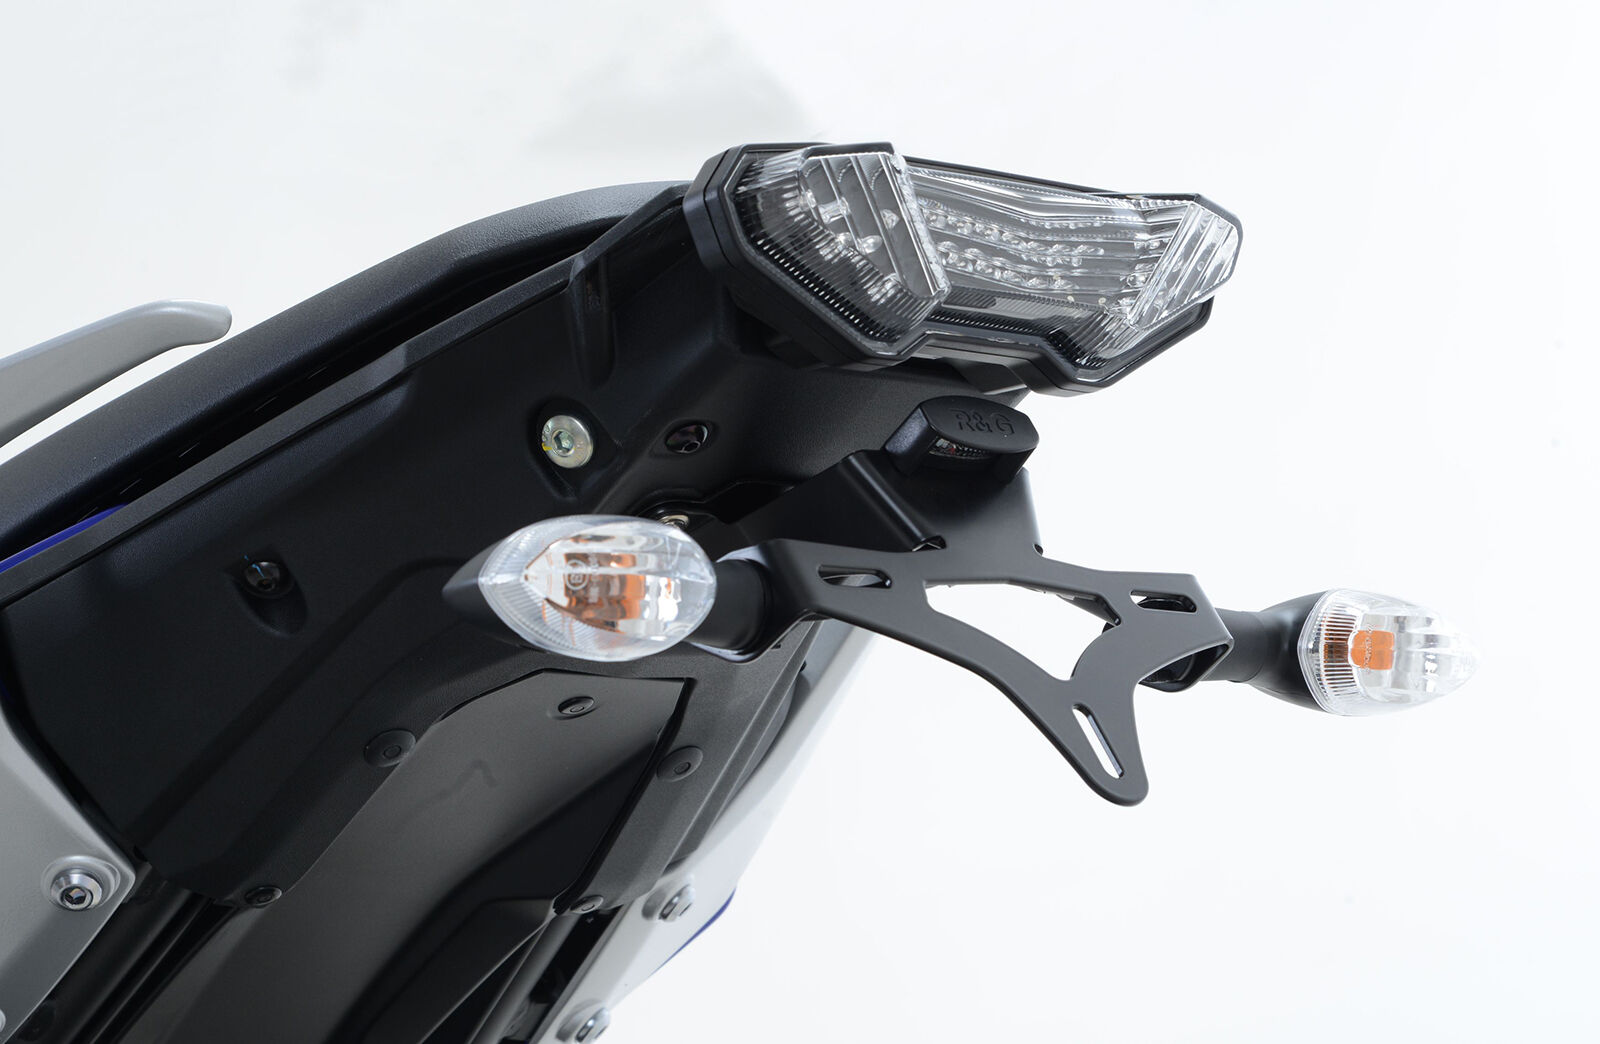 R/&G Racing Tail Tidy For Honda 2016 NC750 X